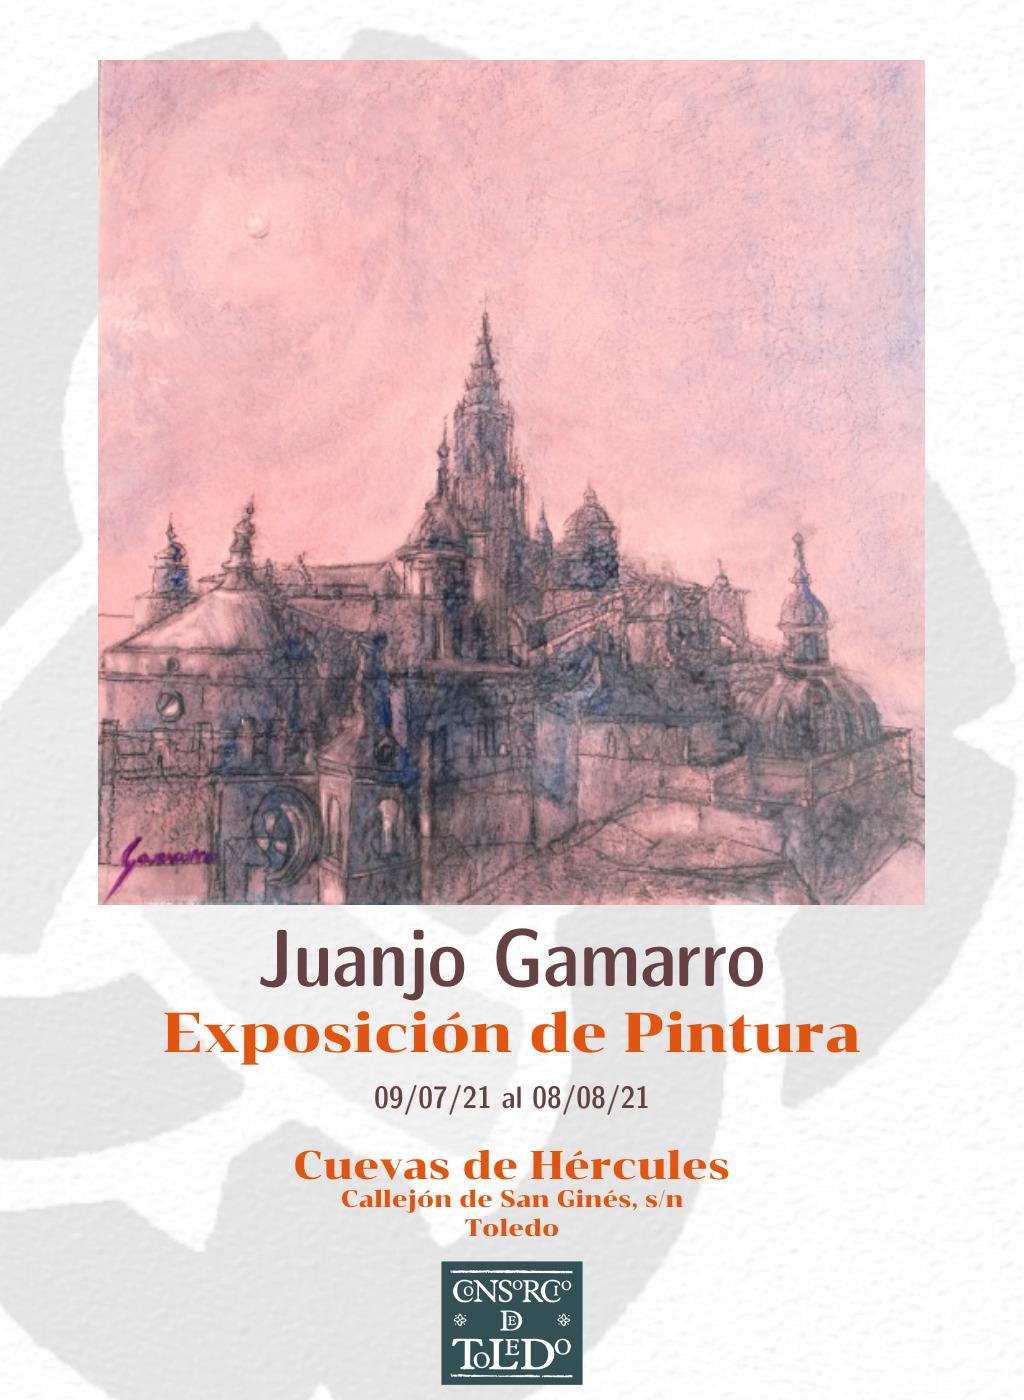 Juango Gamarro